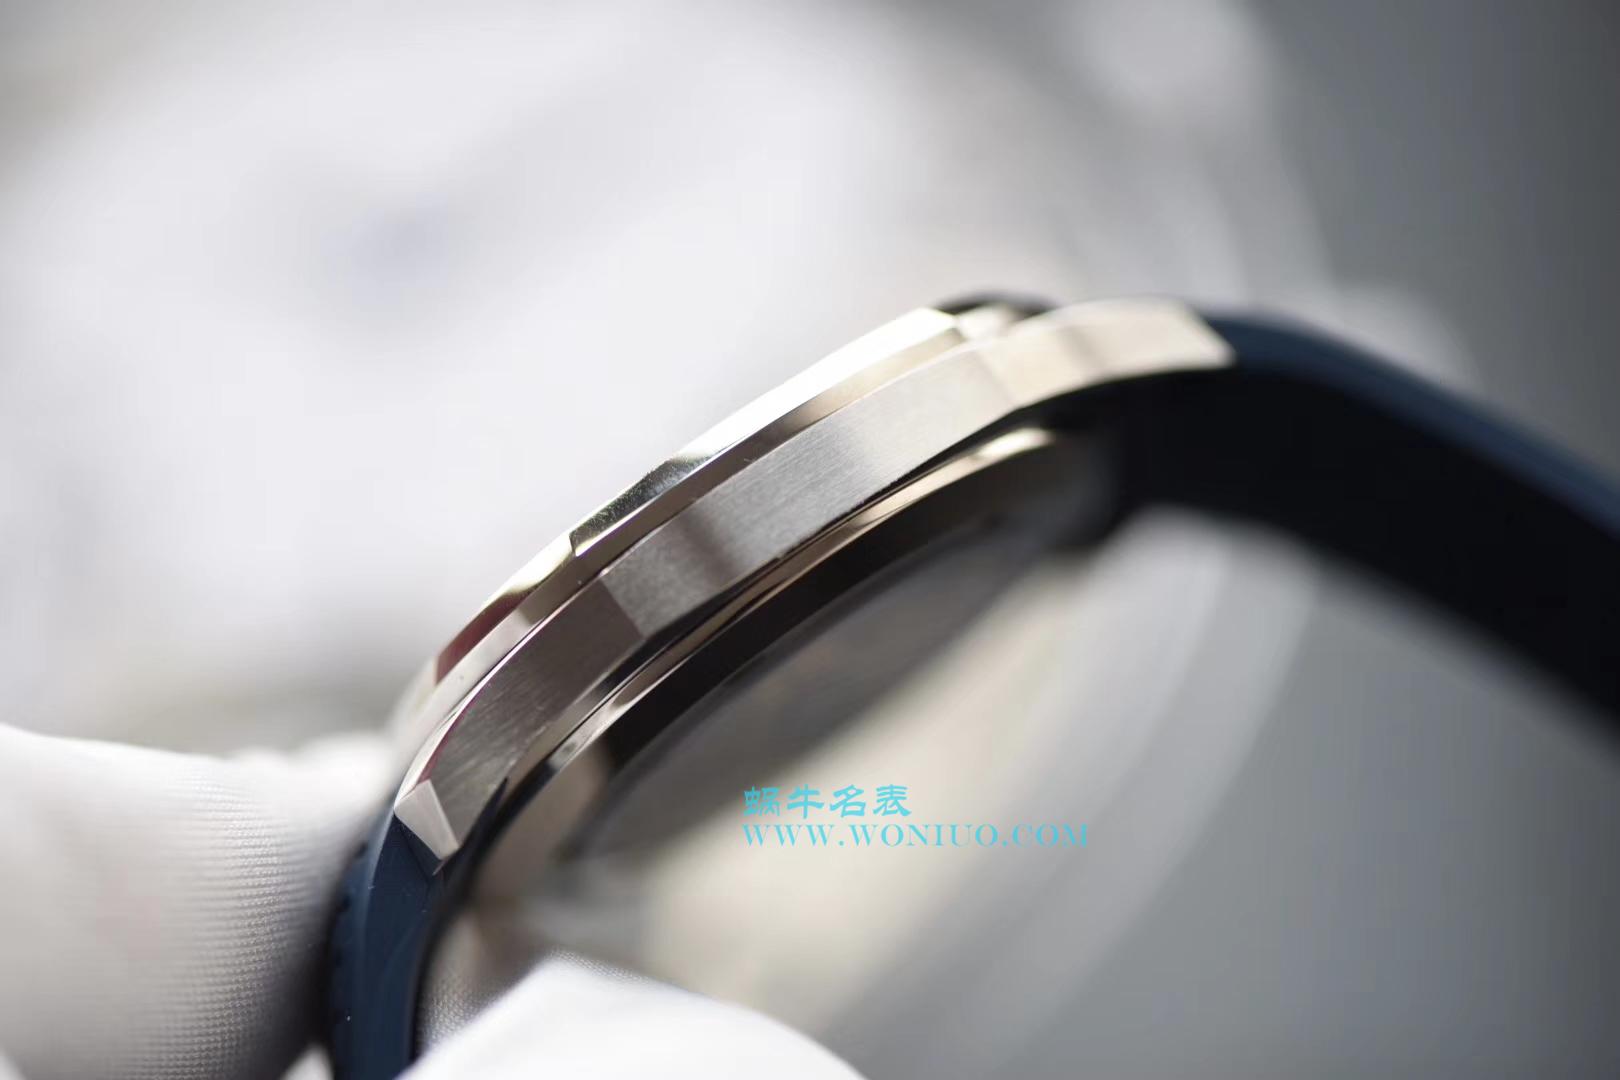 【BP一比一超A高仿手表】百达翡丽AQUANAUT手雷系列5168G-001腕表 / BD161